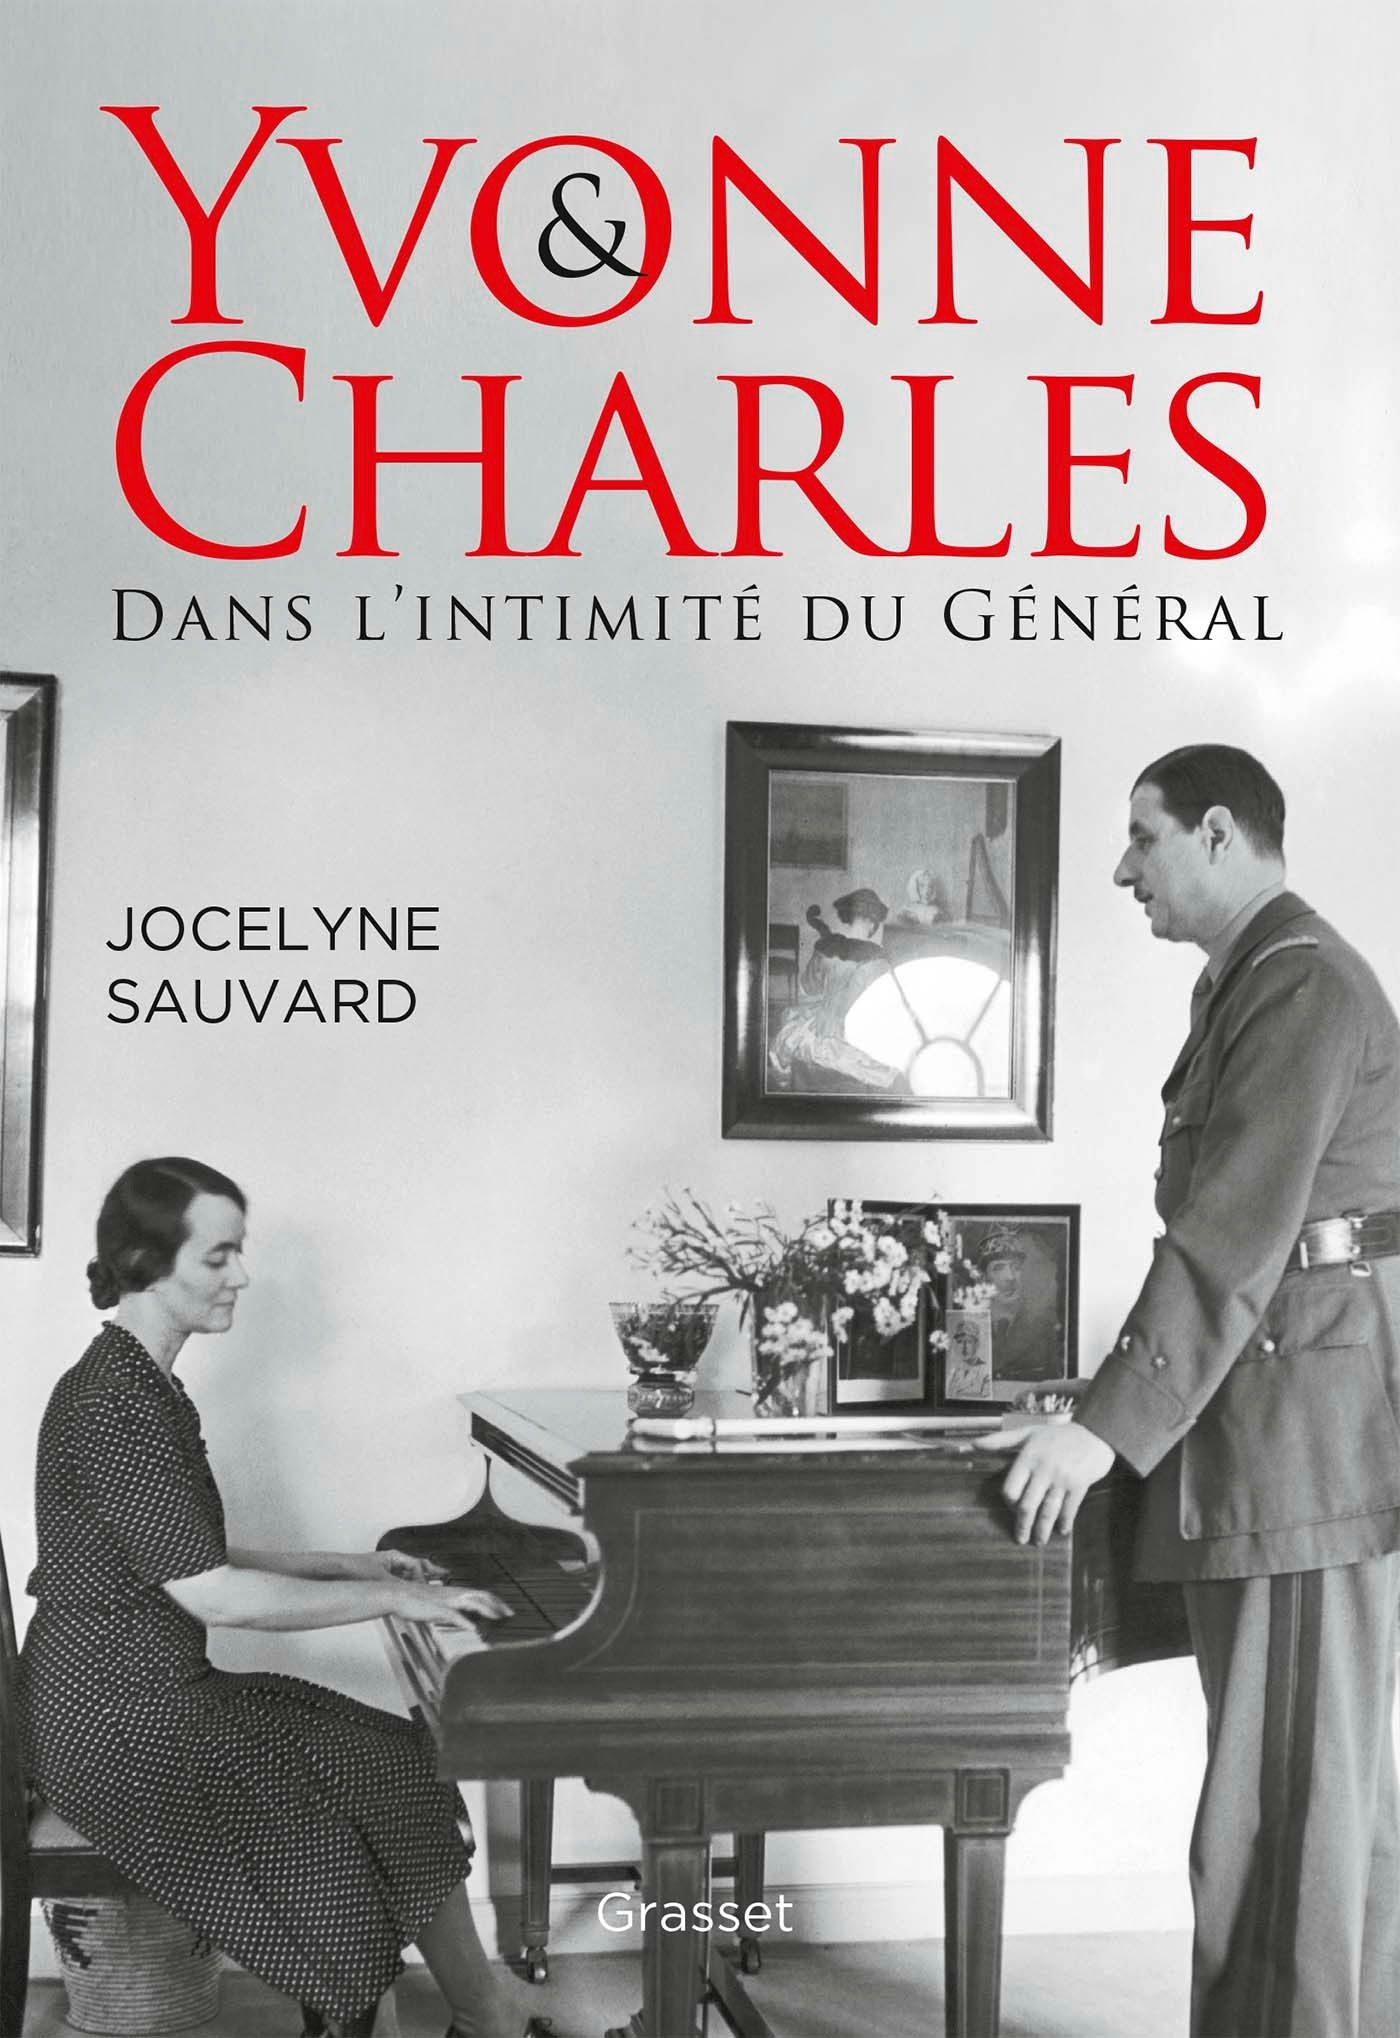 YVONNE ET CHARLES - DANS L'INTIMITE DU GENERAL